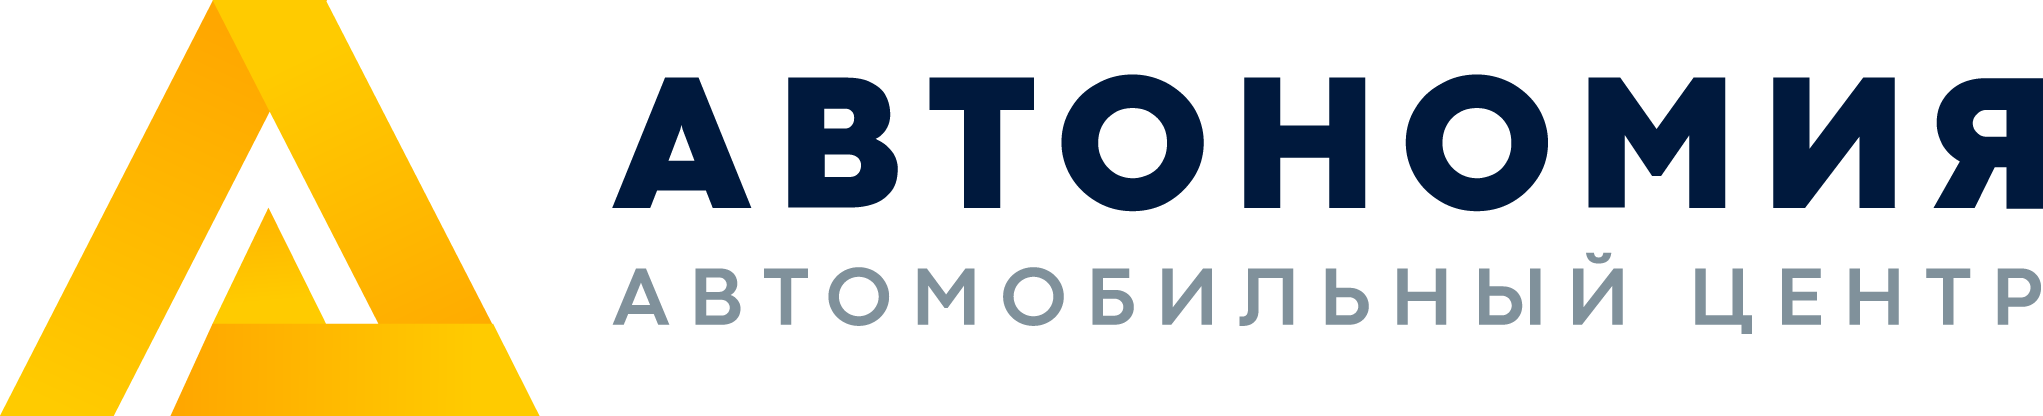 Автономия автосалон